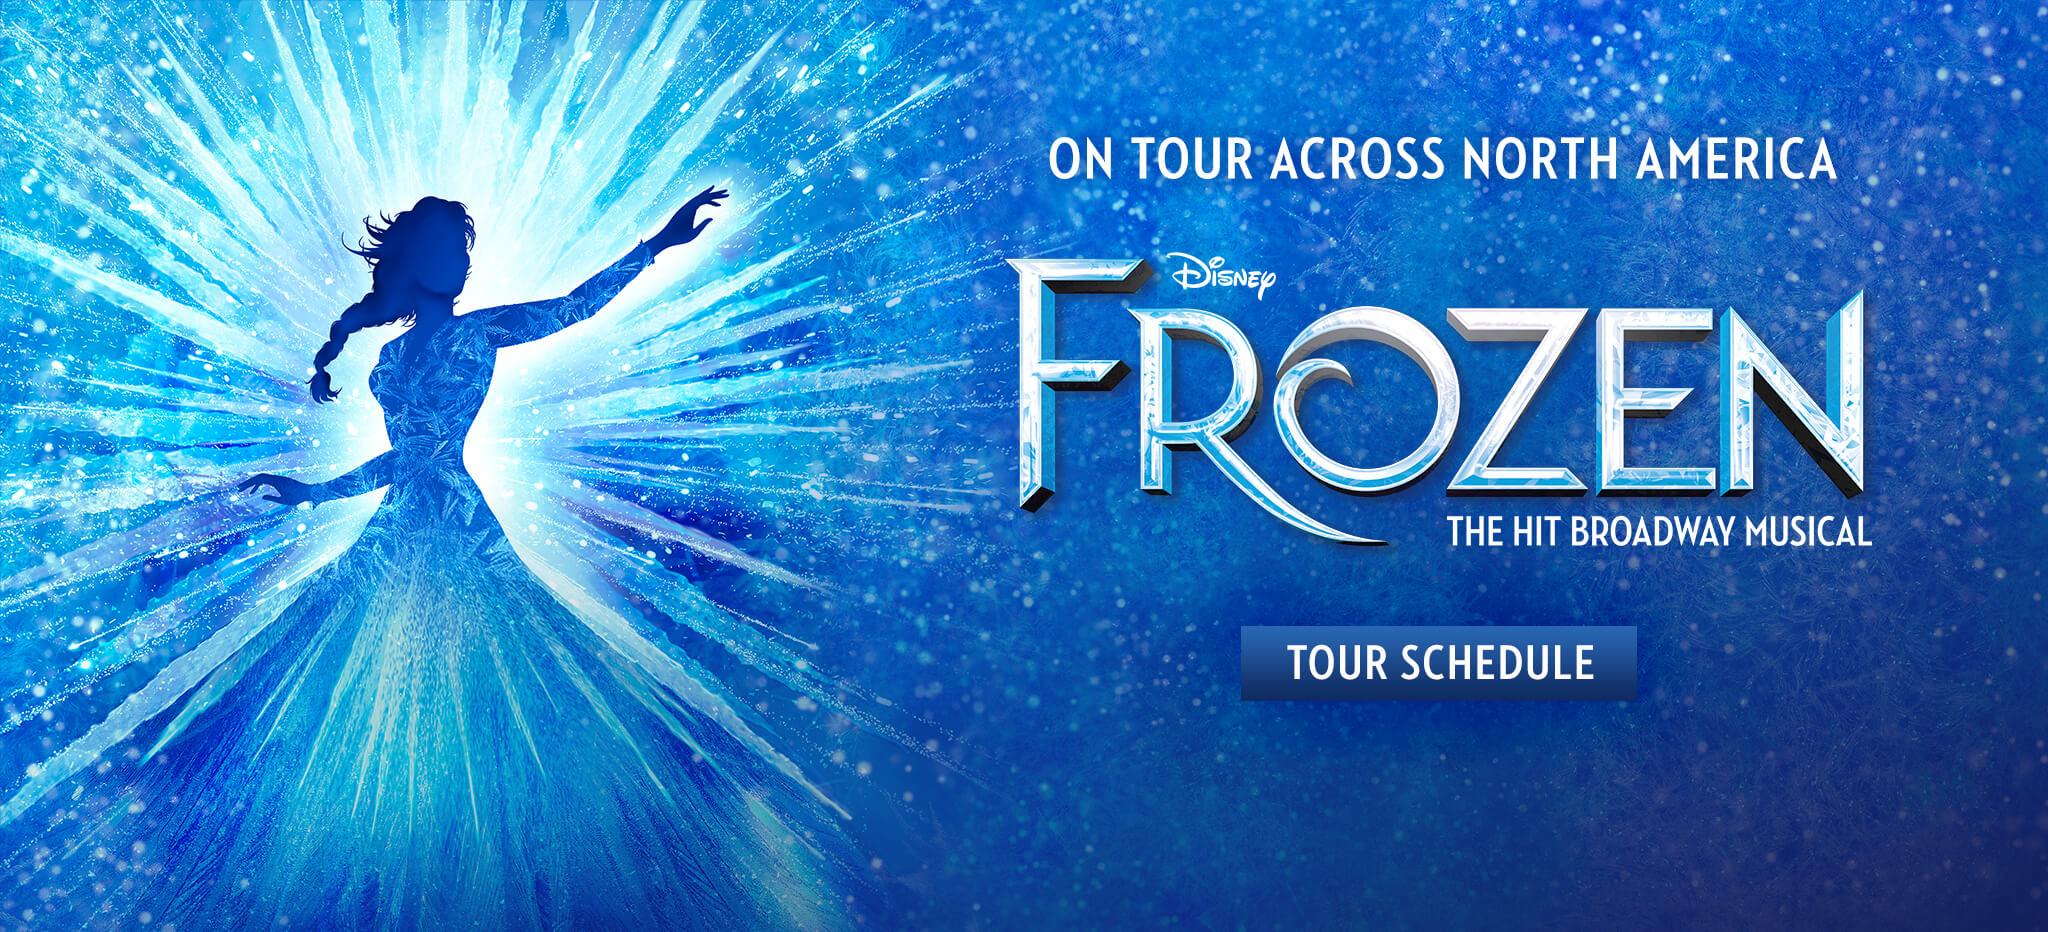 Disney FROZEN - On Tour Across North America - View Tour Schedule